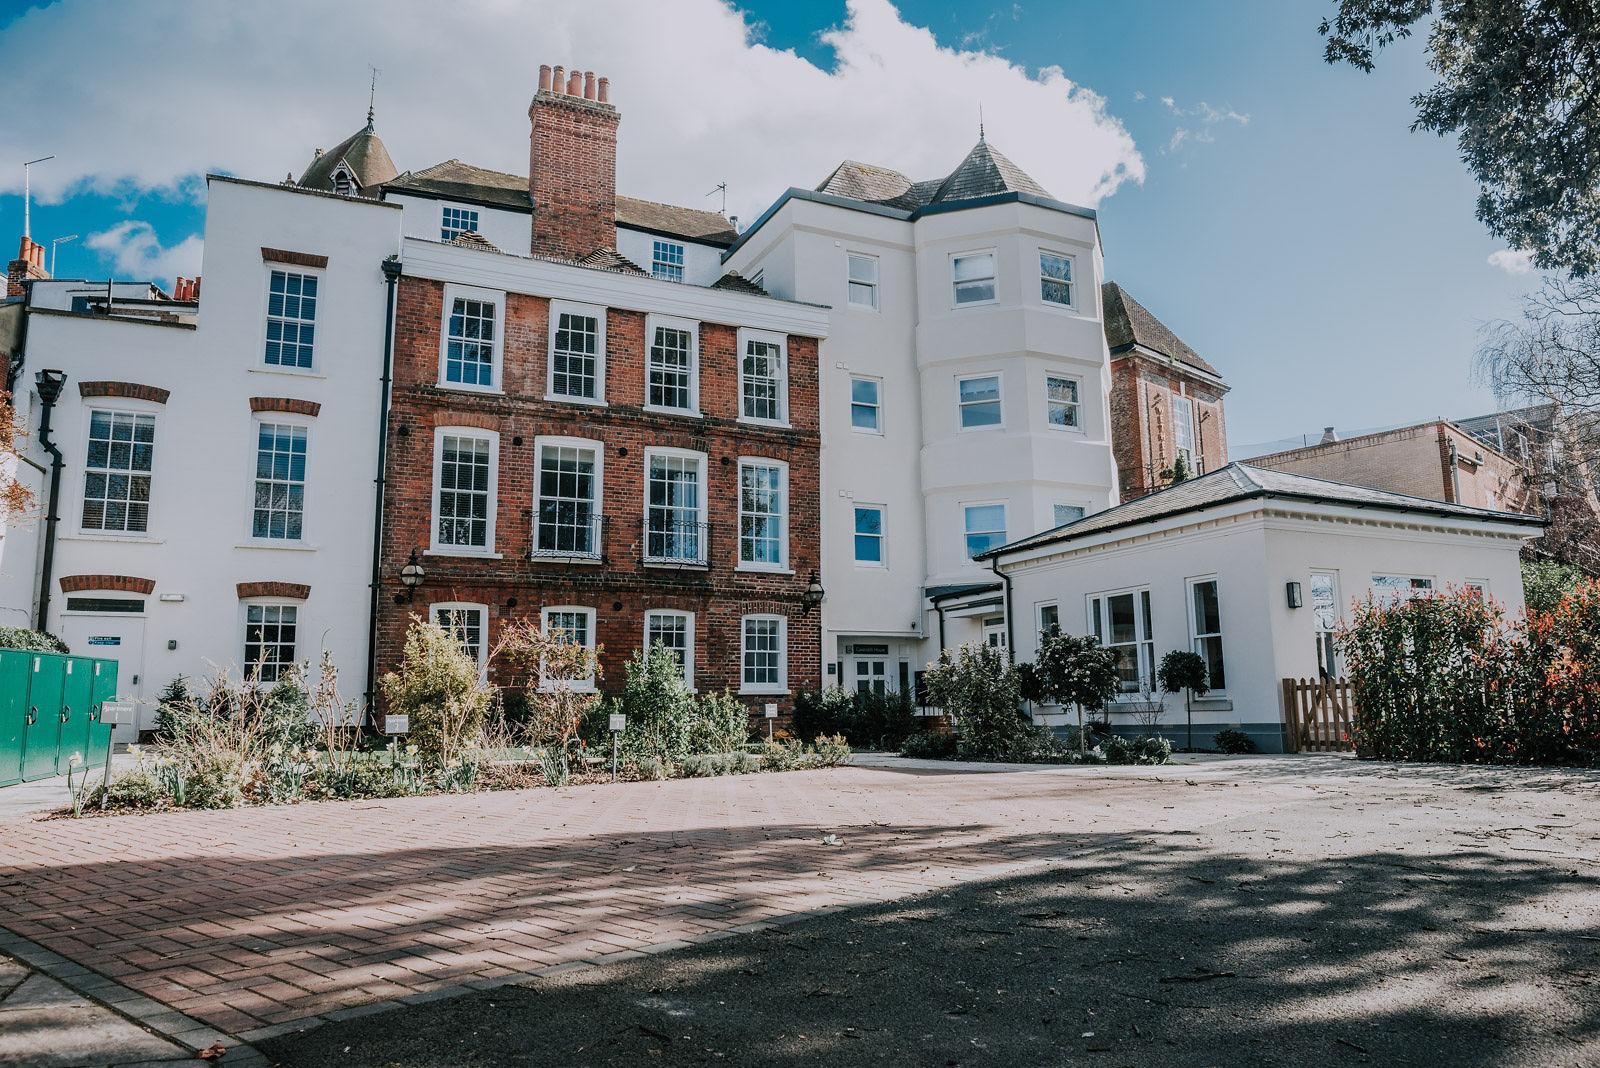 Exterior at Cavendish House